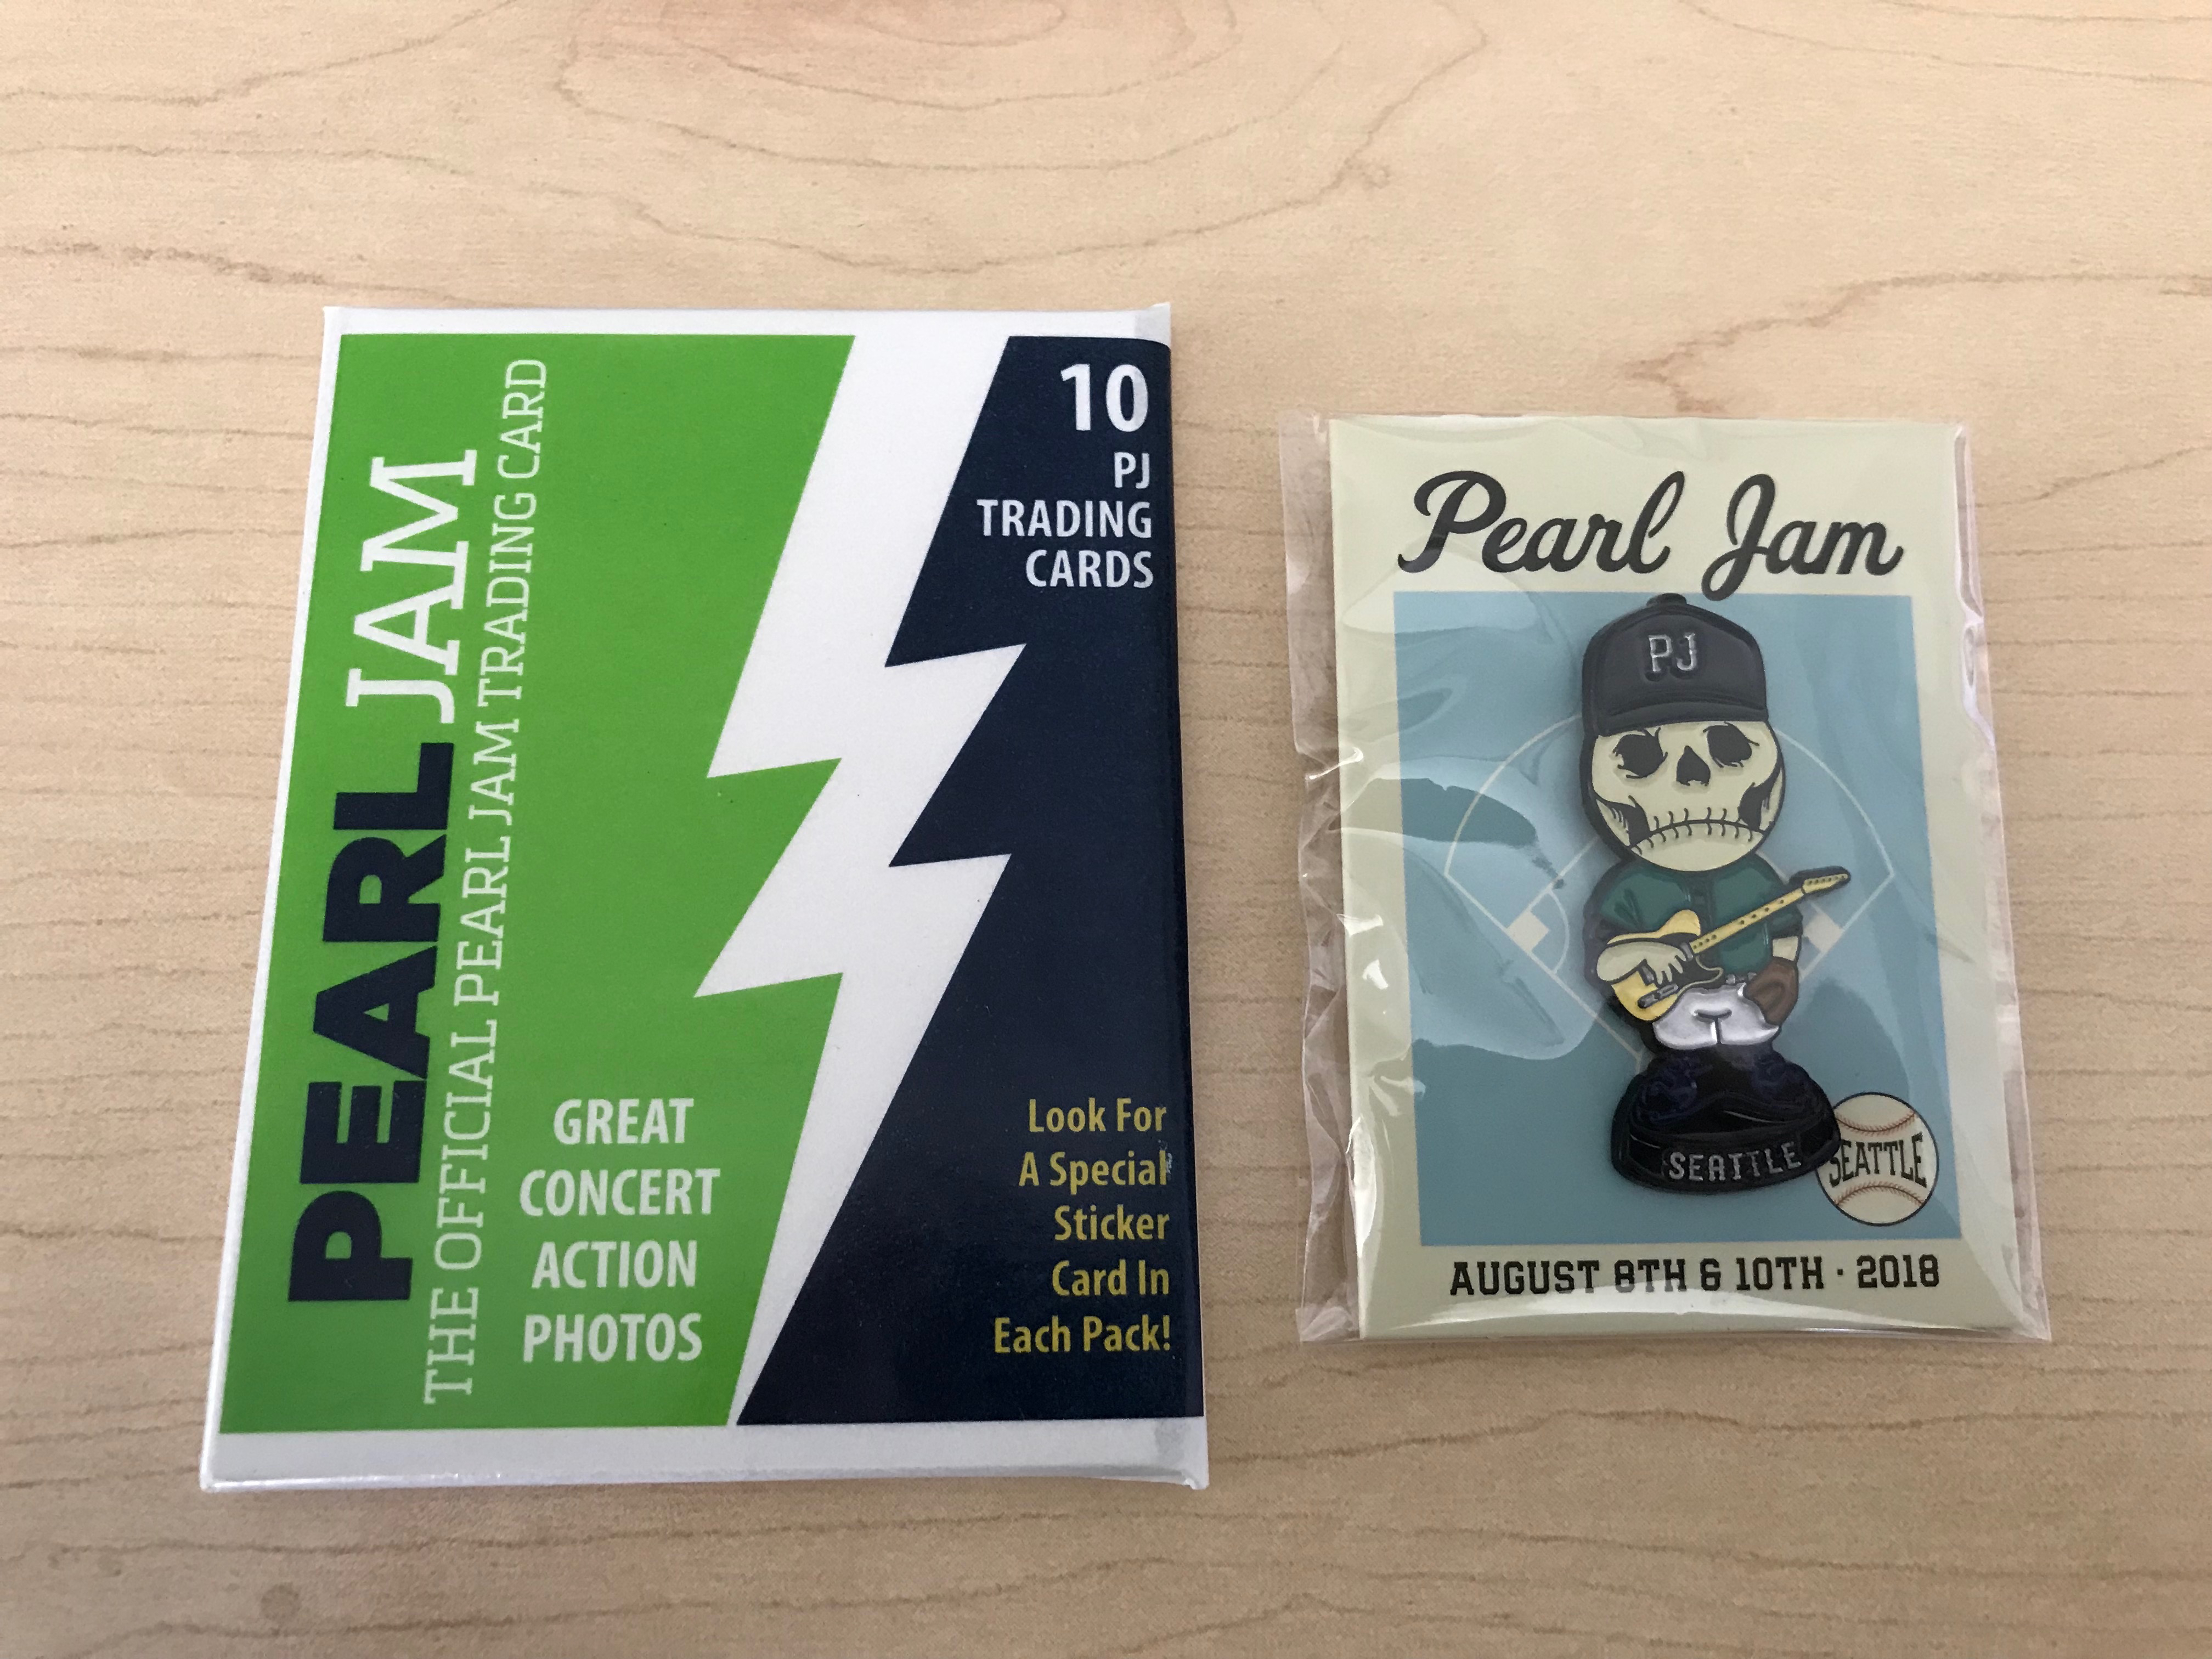 Trade Home Shows Pinbaseball Cards For Wrigley Or Boston